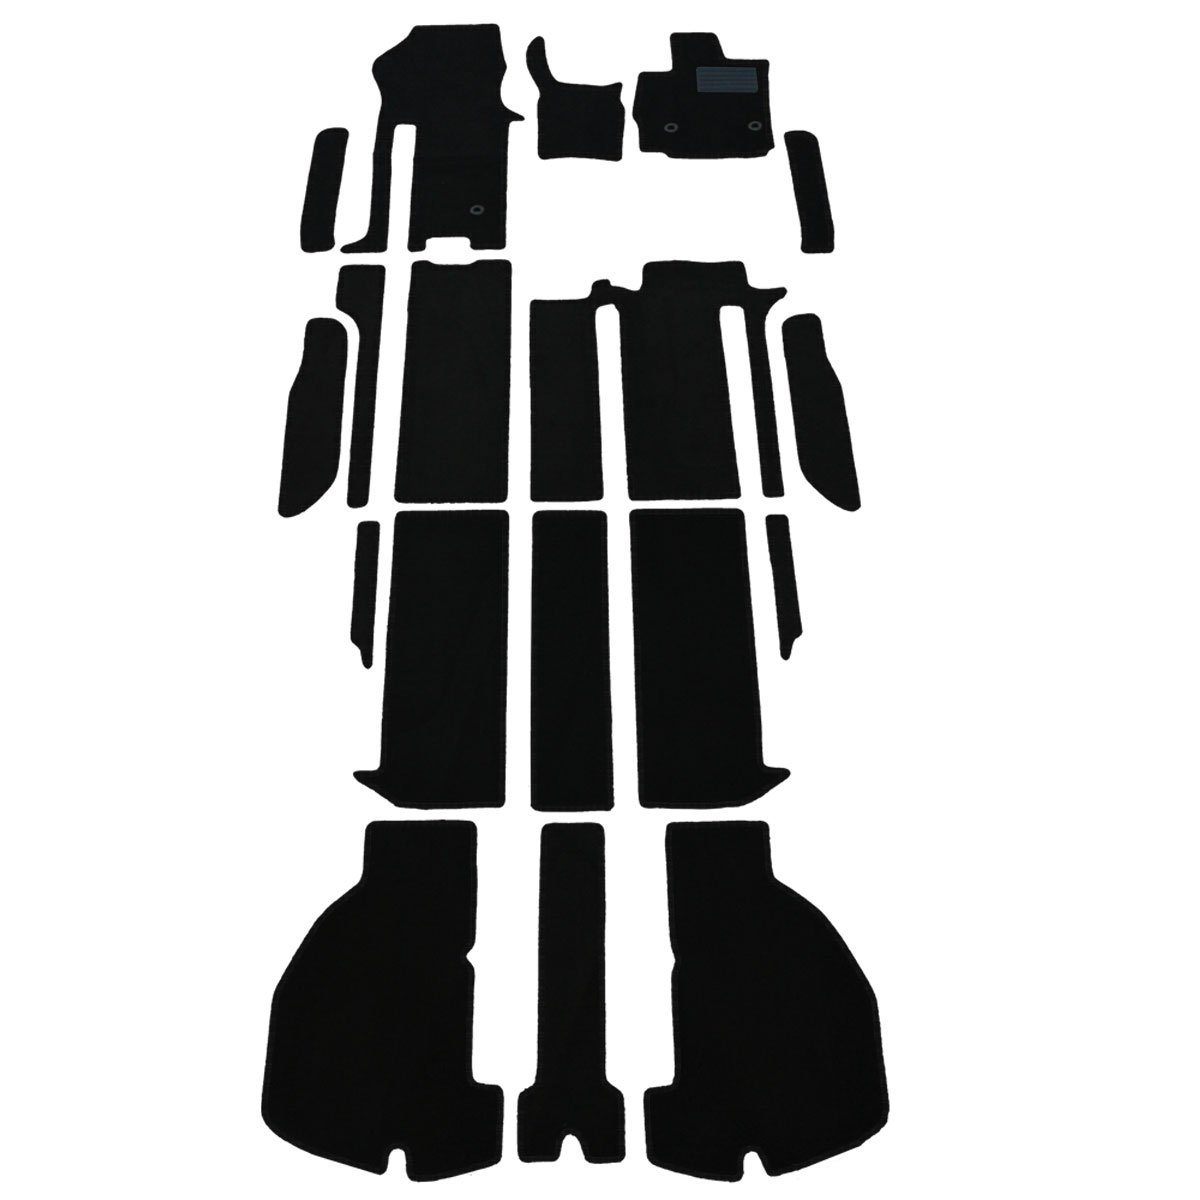 D.Iプランニング カー用品 フロアマット & ステップマット セット 型番1 【 トヨタ アルファード 30系 】 車用 カーマット DX黒 B010RSEK4Q 型番1|DX黒 DX黒 型番1